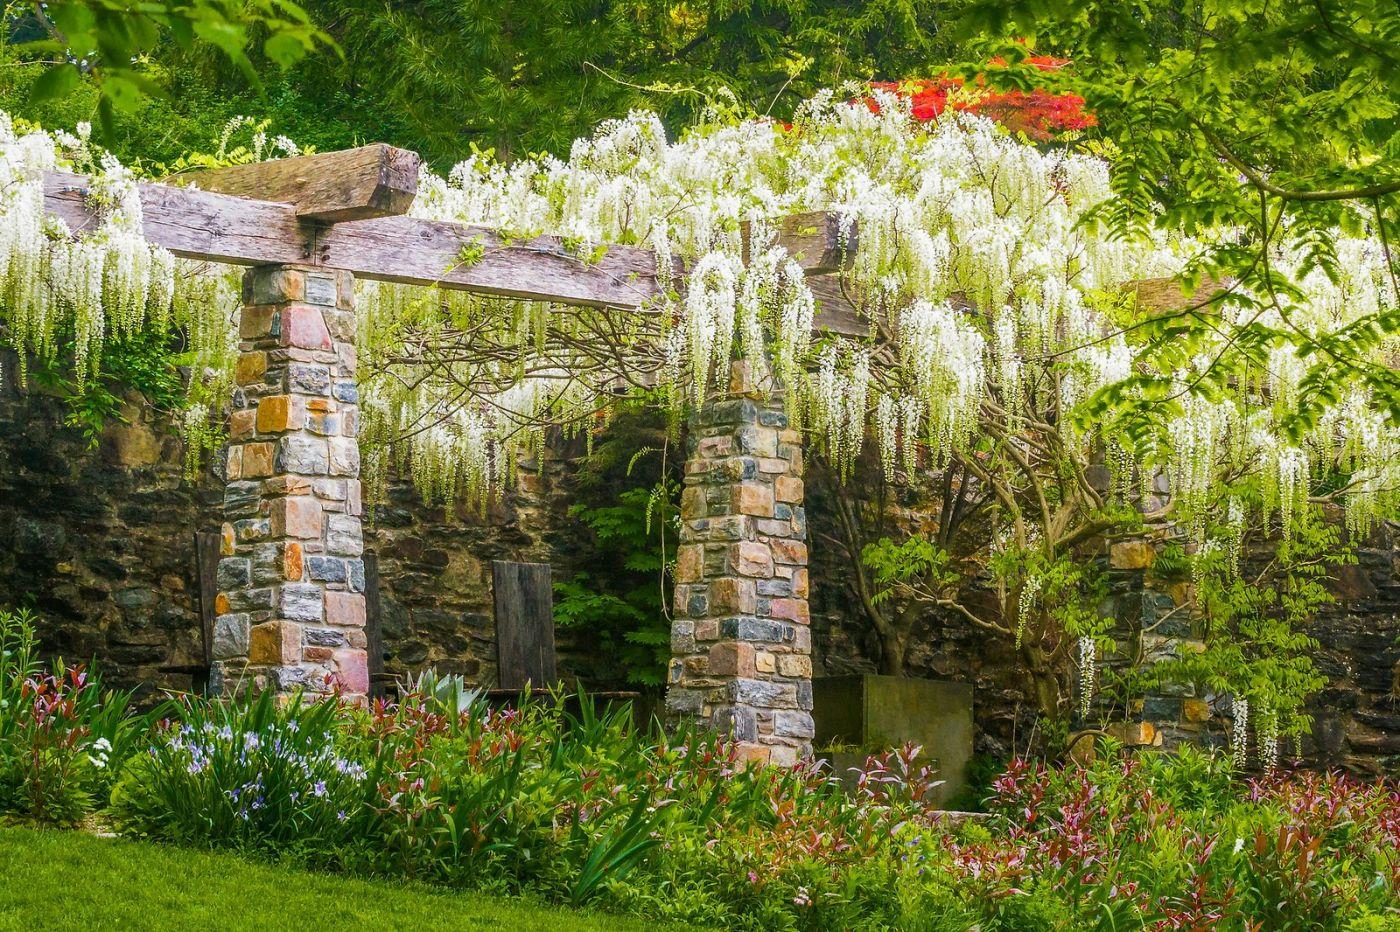 Chanticleer花园,那年盛开的紫藤花_图1-34